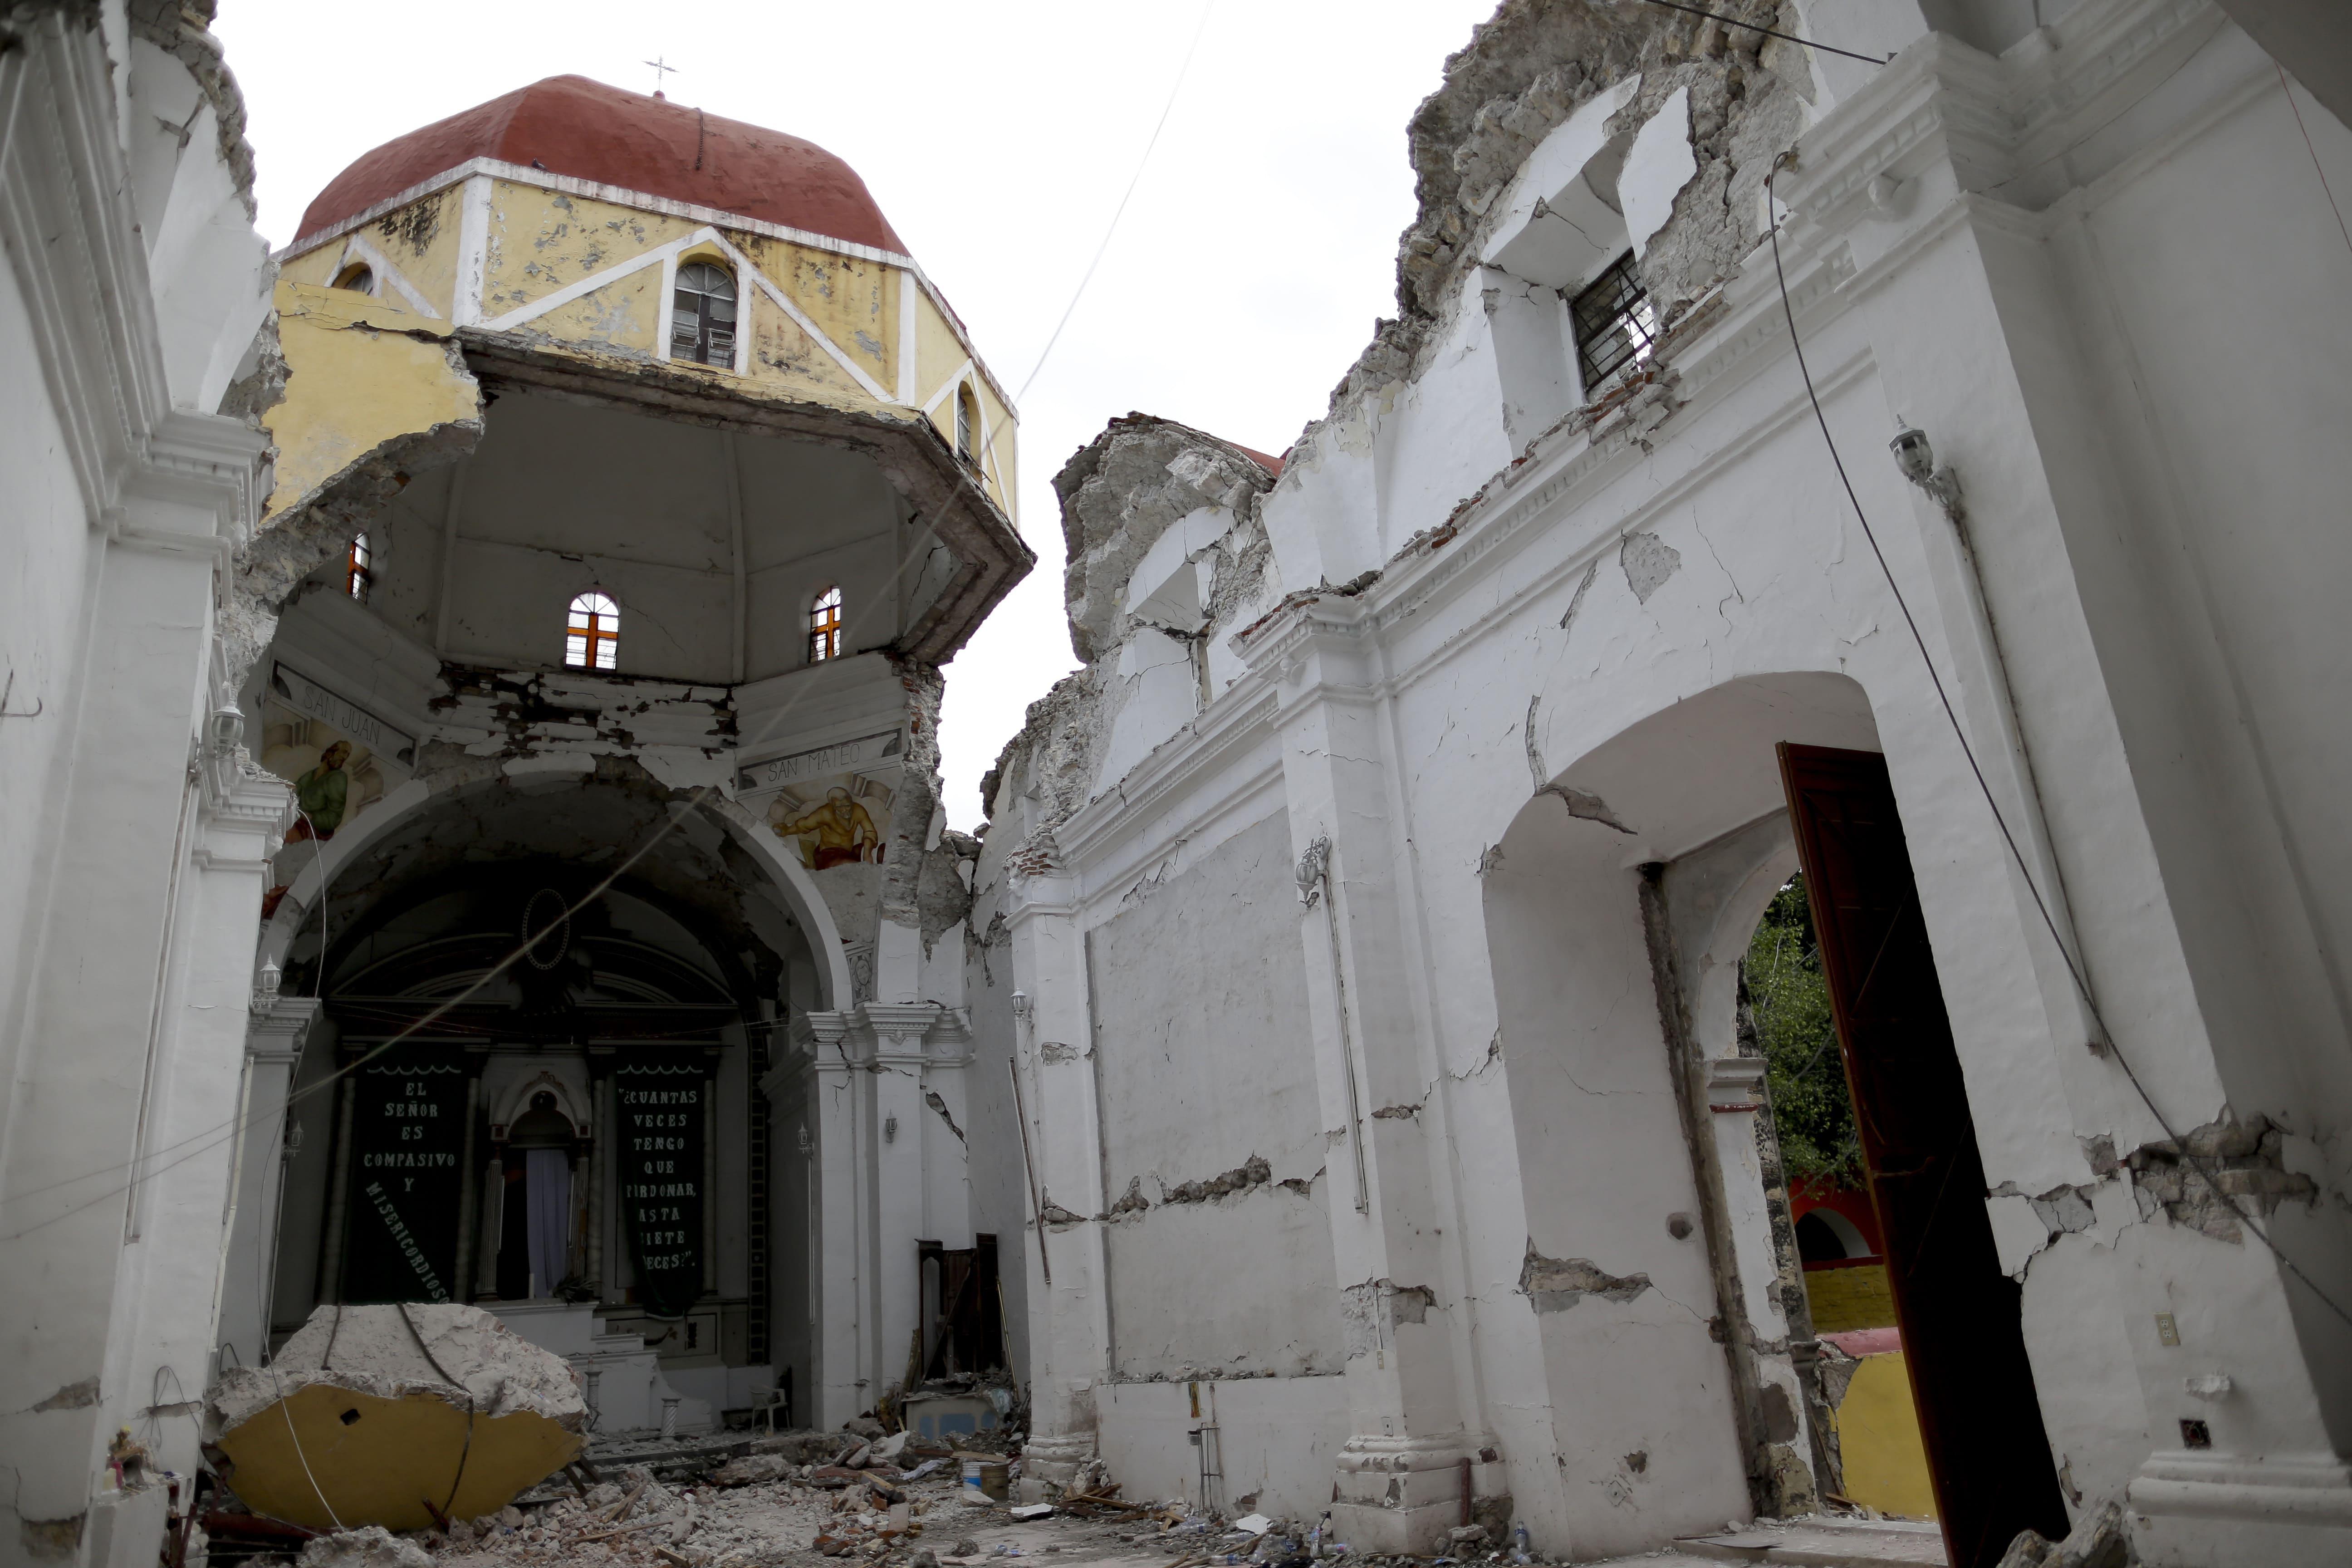 Daños en patrimonio histórico por sismo